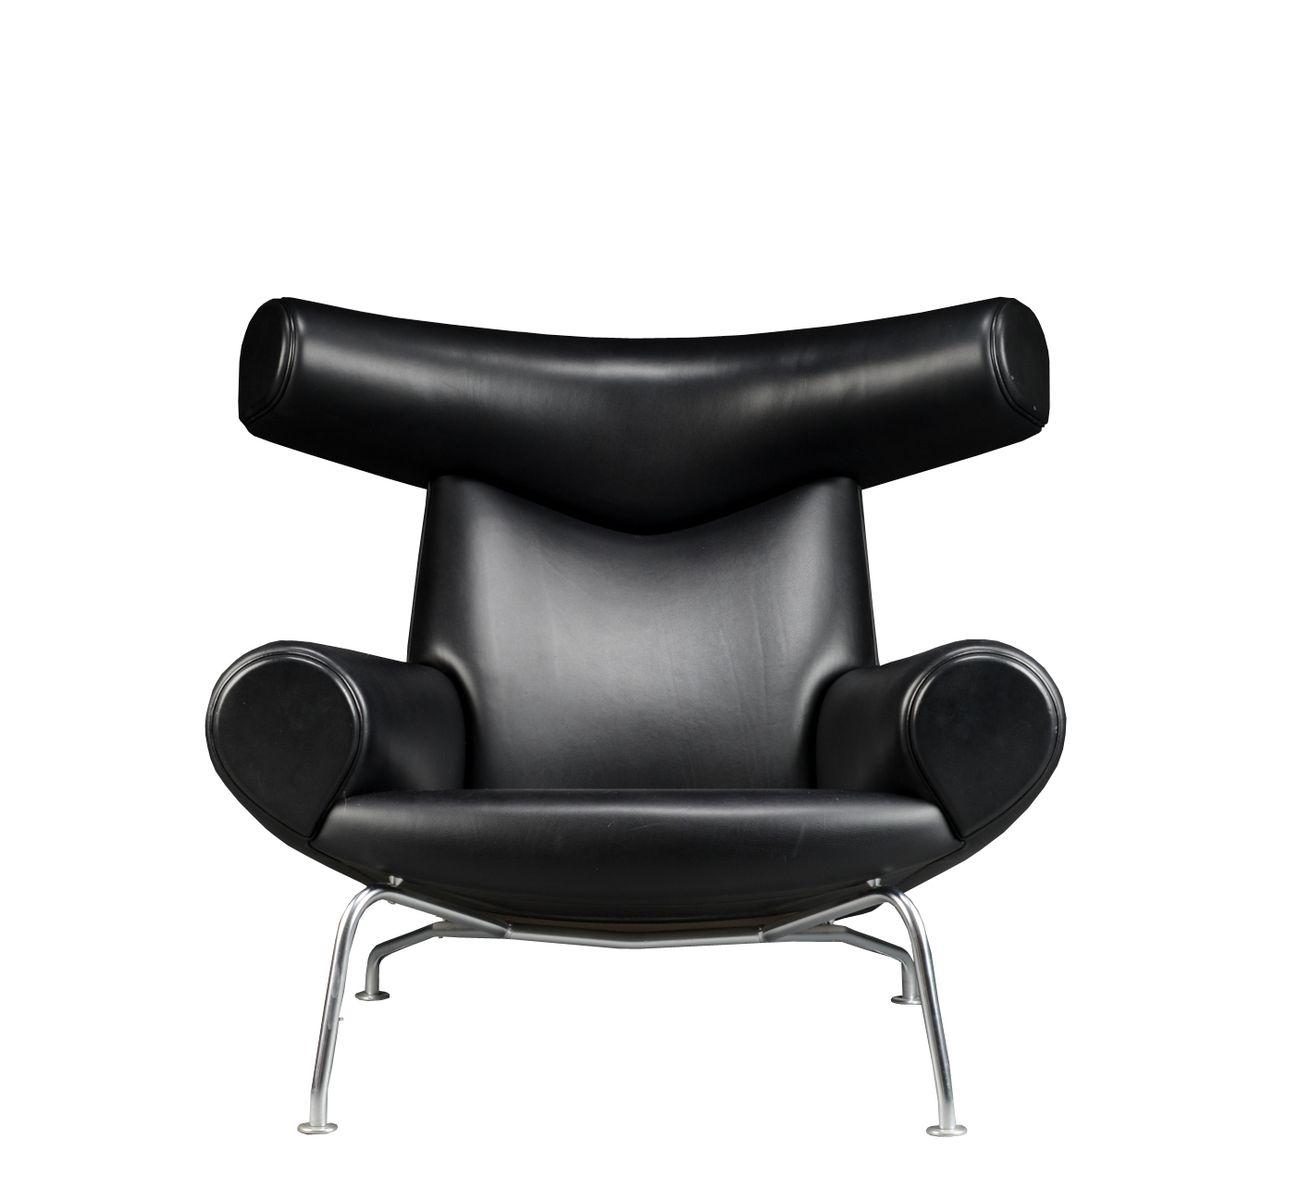 hans j wegner furniture. Vintage EJ-100 Ox Chair And Ottoman By Hans J. Wegner For Erik Jorgensen J Furniture